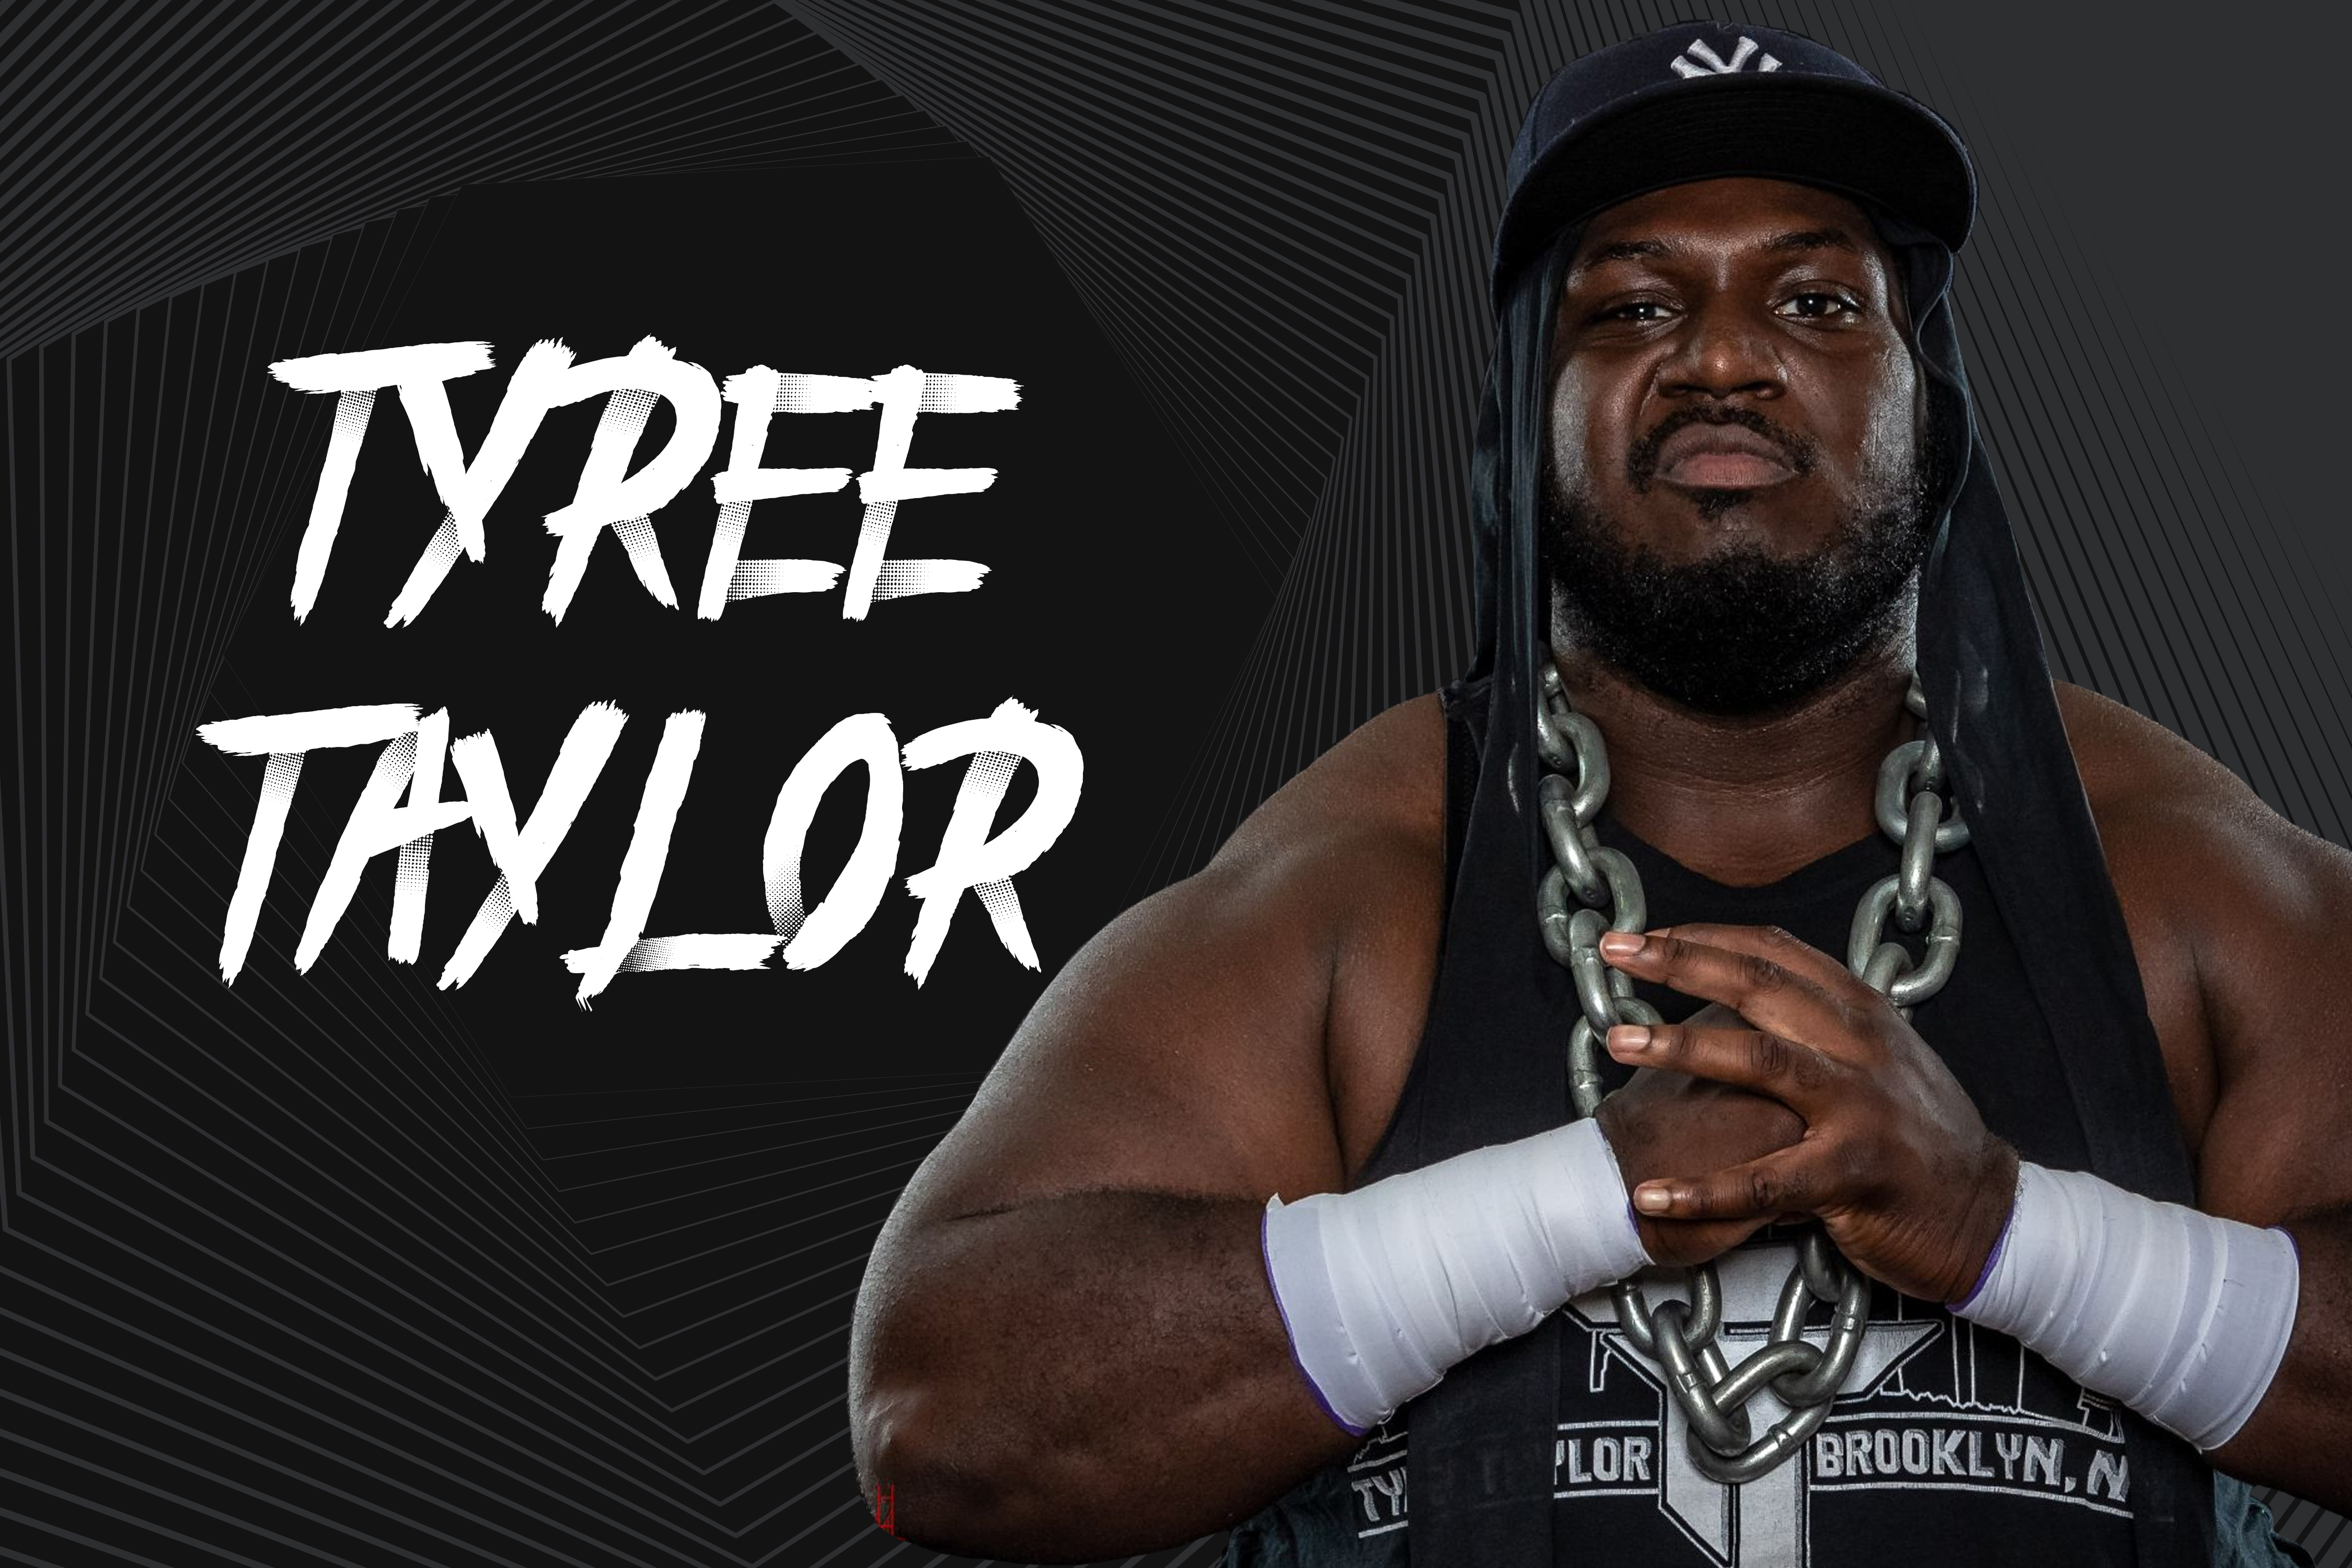 Tyree Taylor